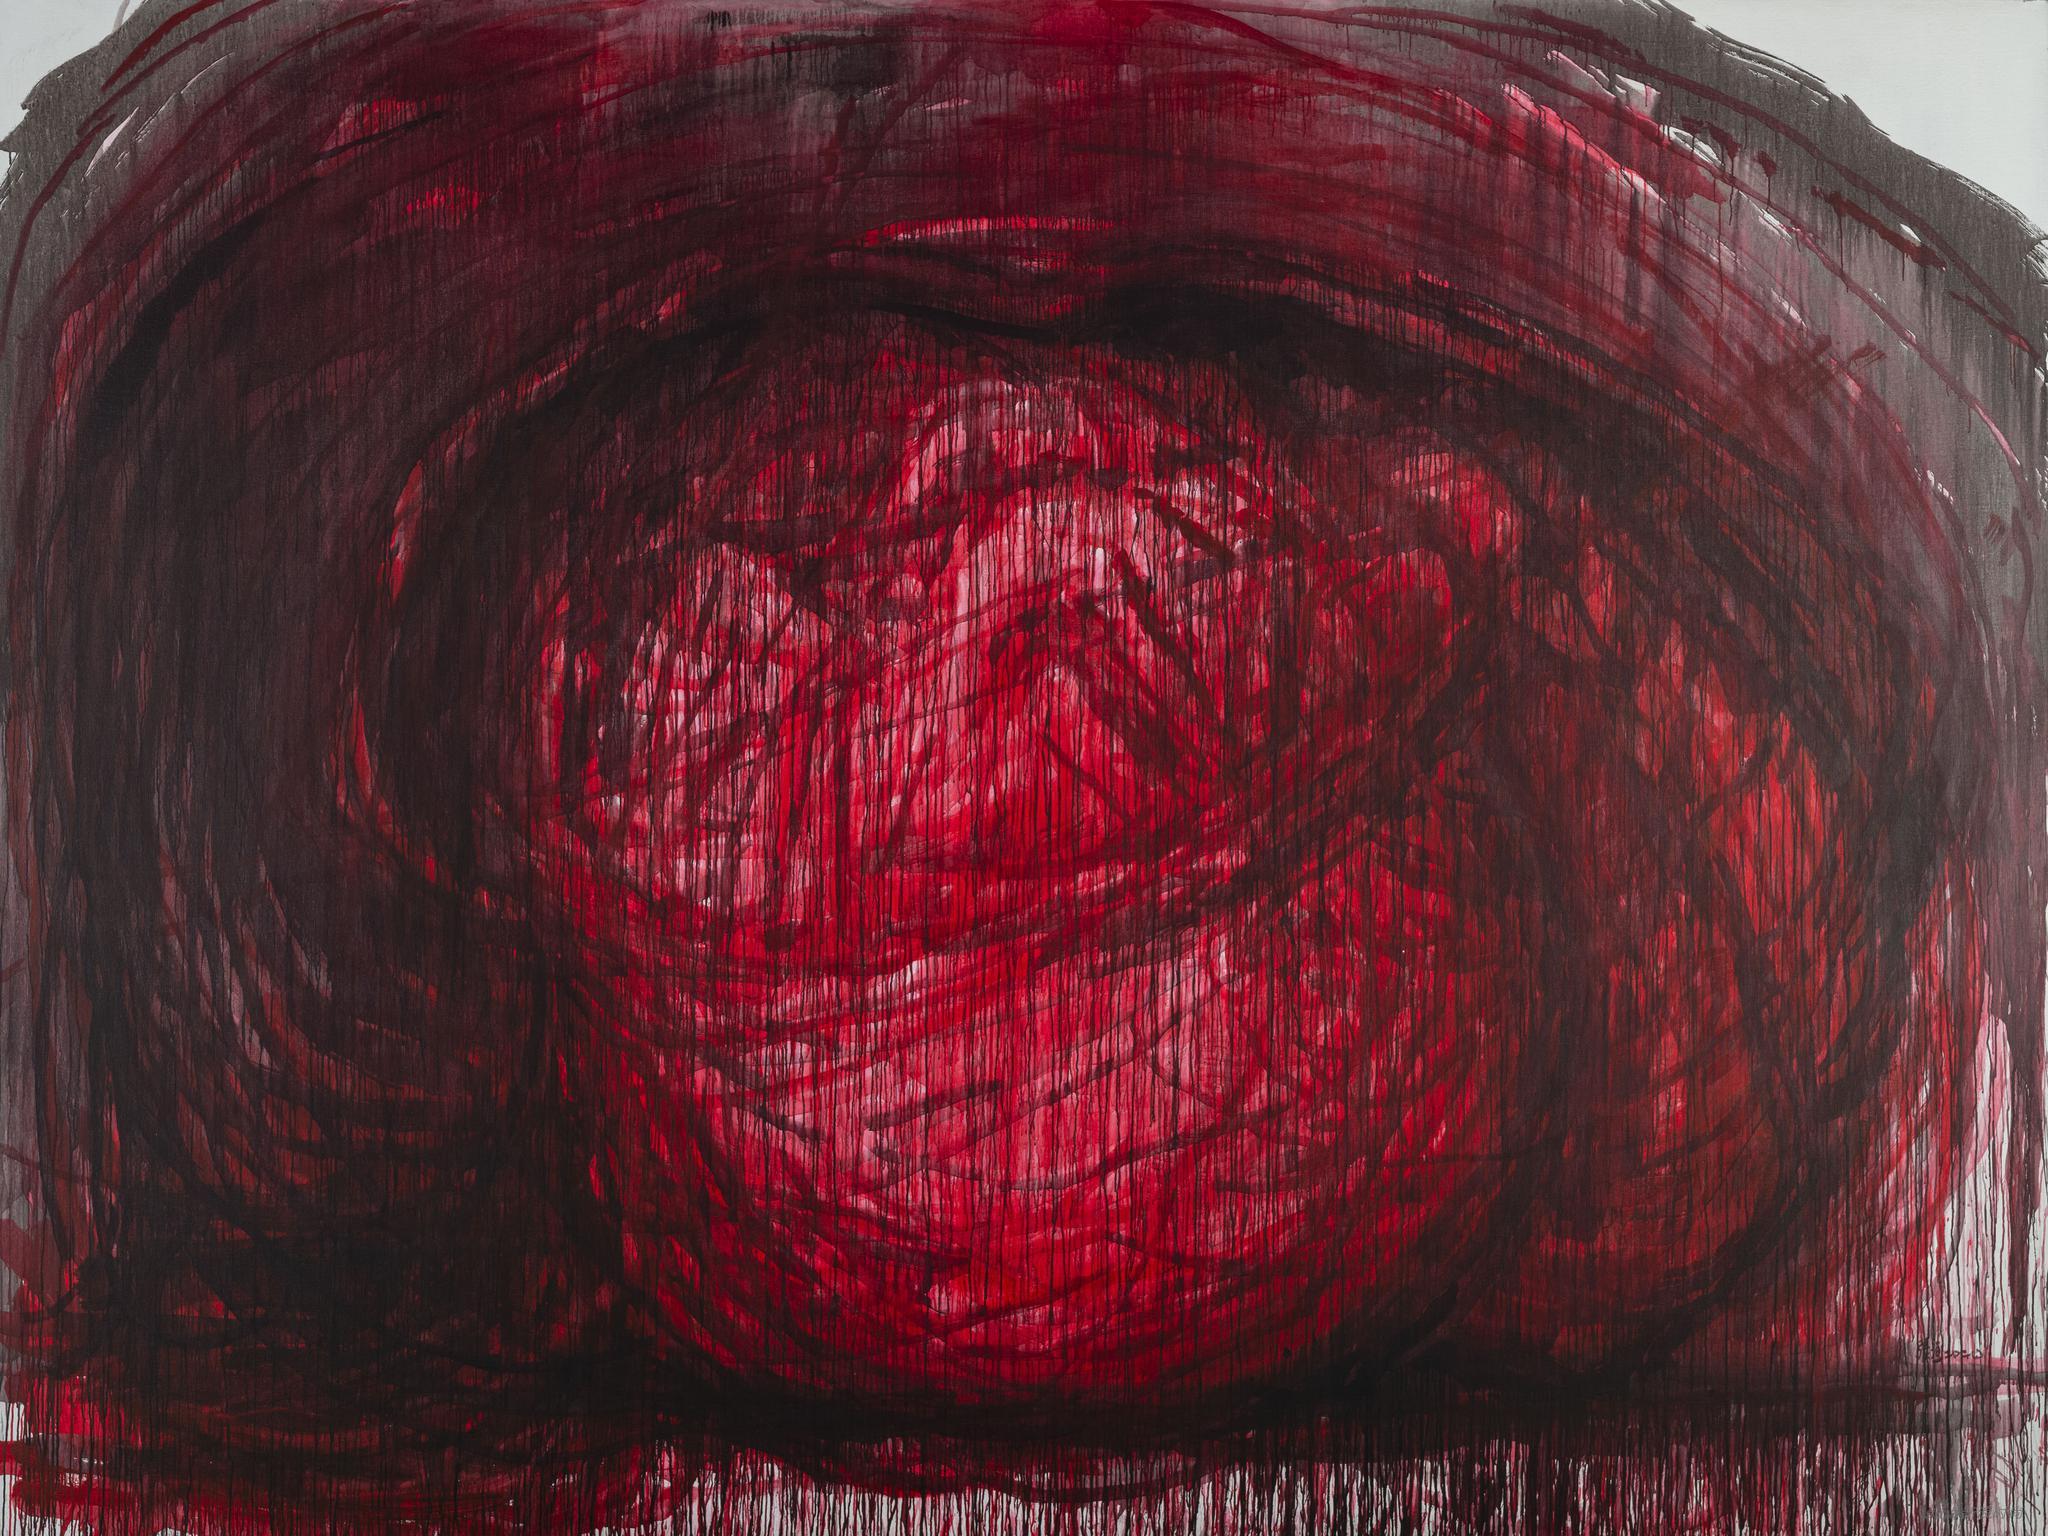 张洹, b.1965, Love No.7, 2020, Arcylic on Linen, 300 x 400 x 5 cm